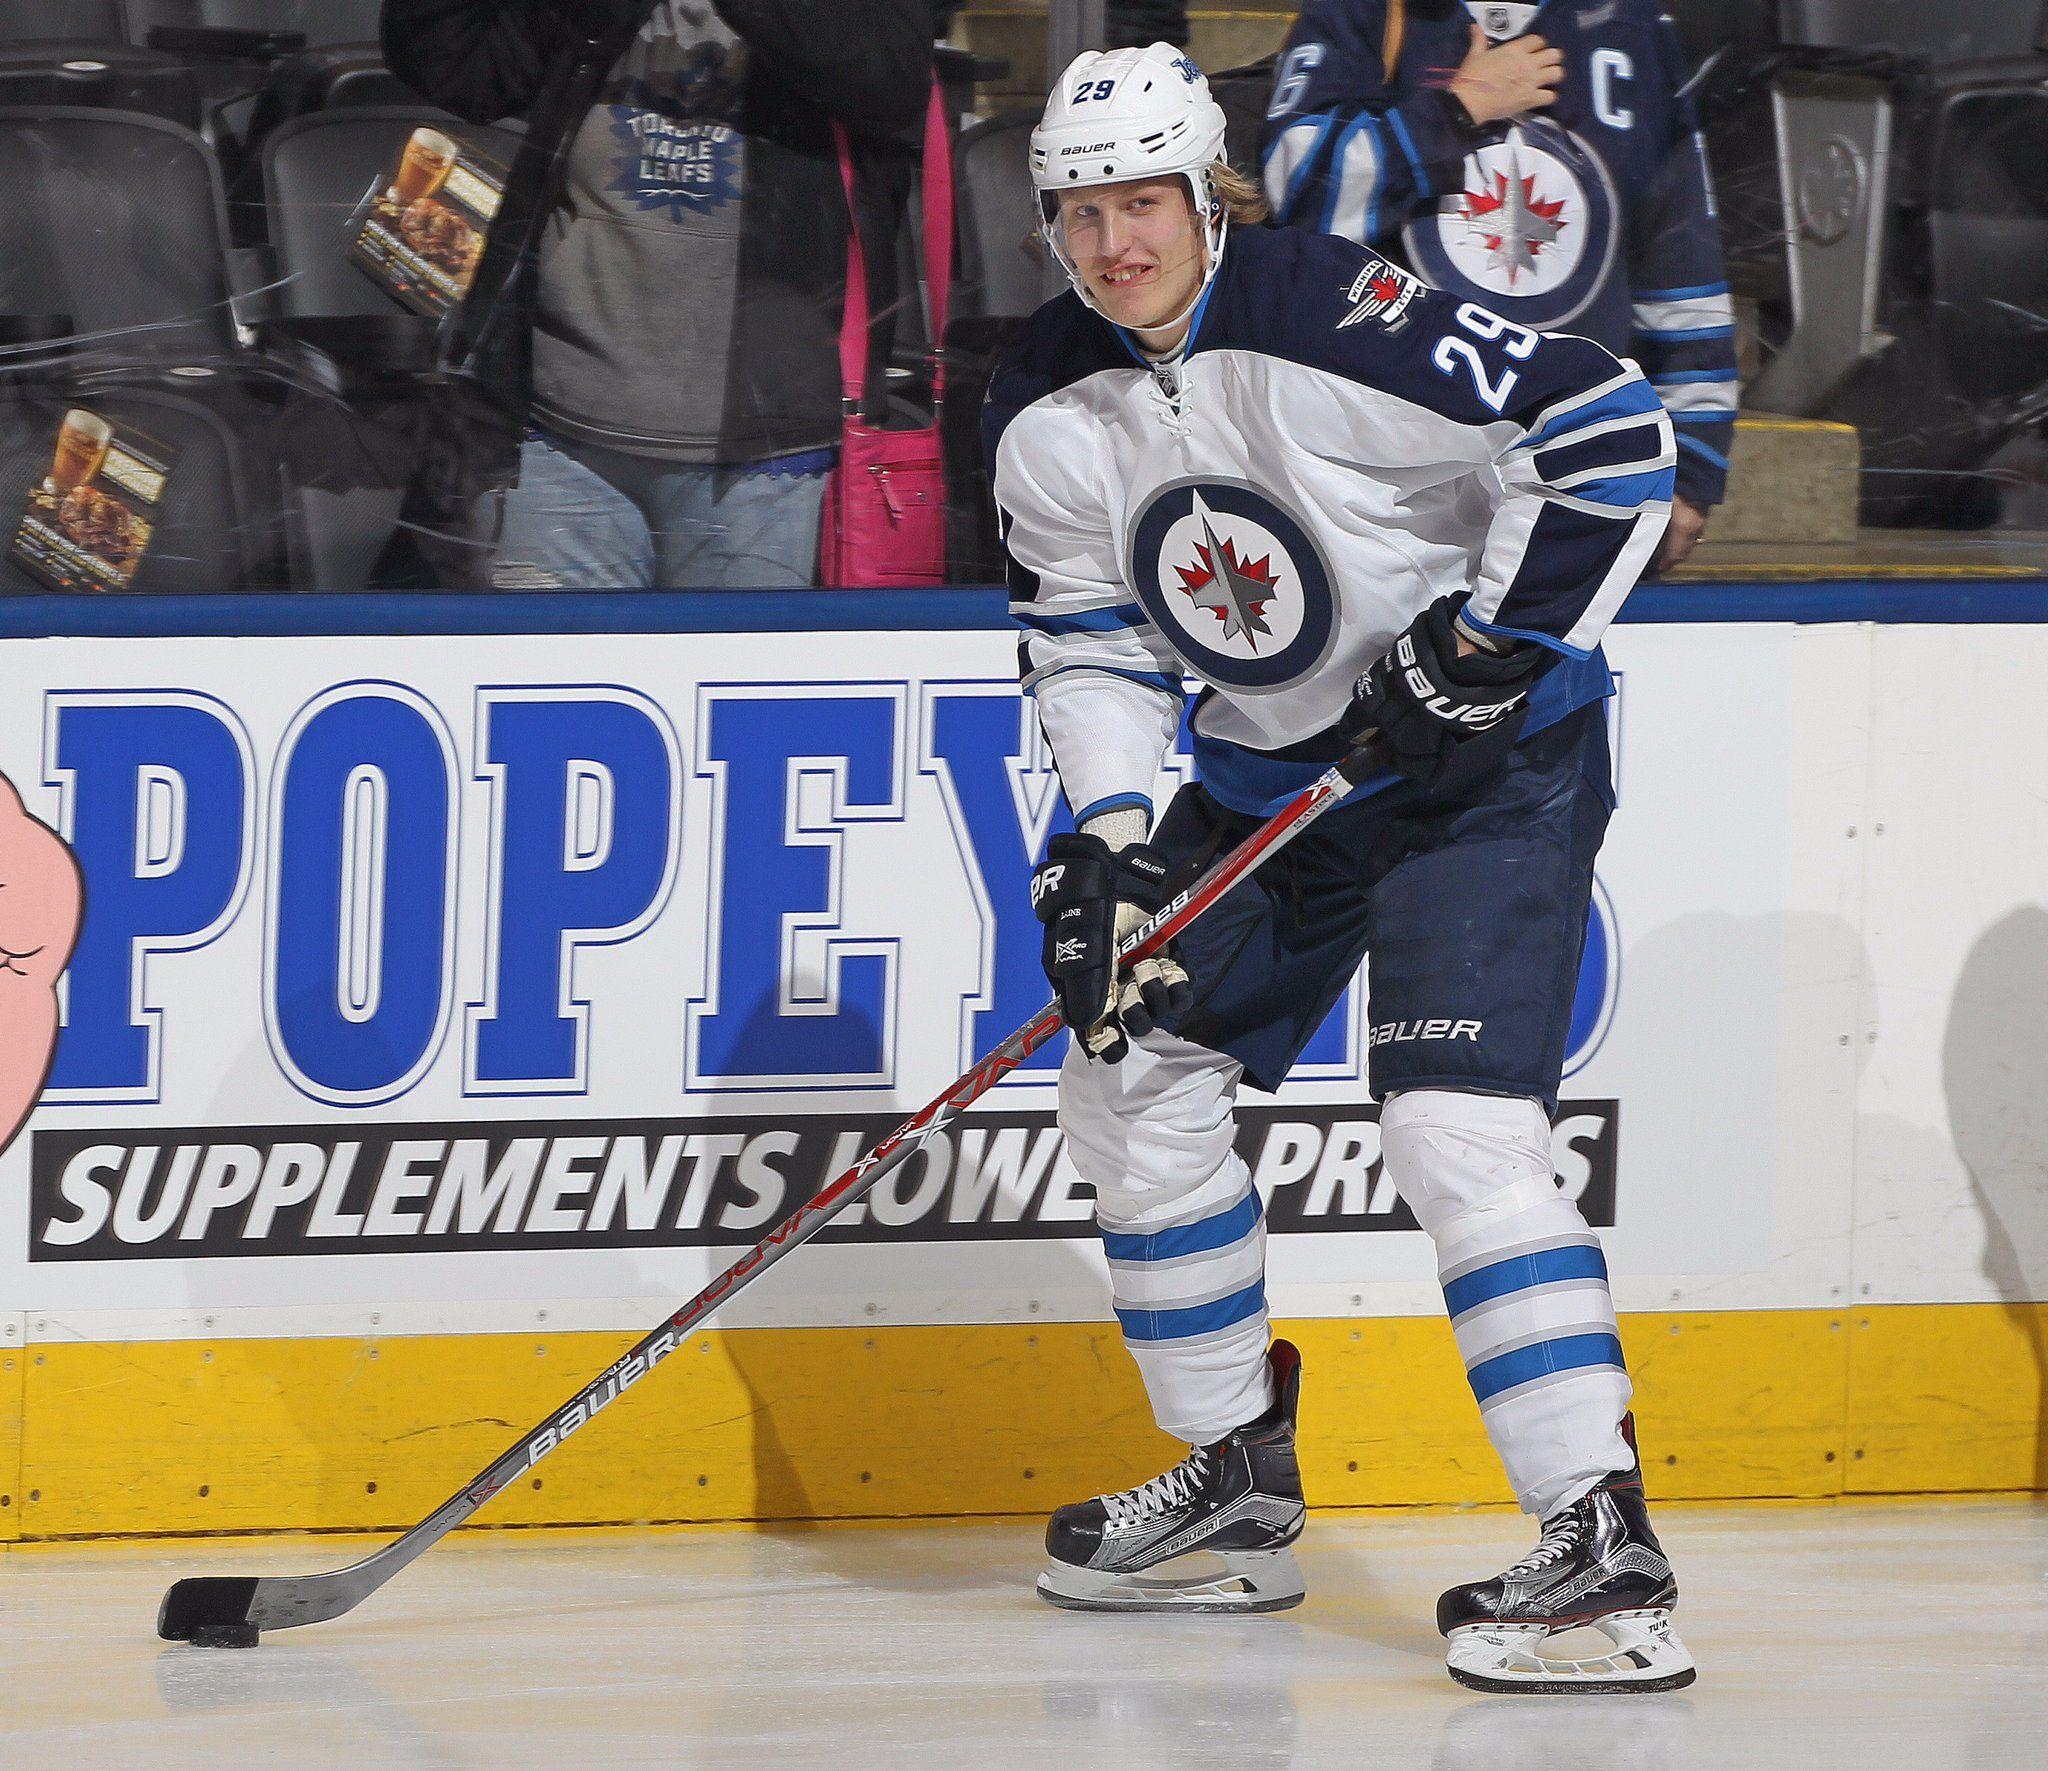 Patrik Laine Scored His 29th Goal Of 2016-17 To Regain NHL